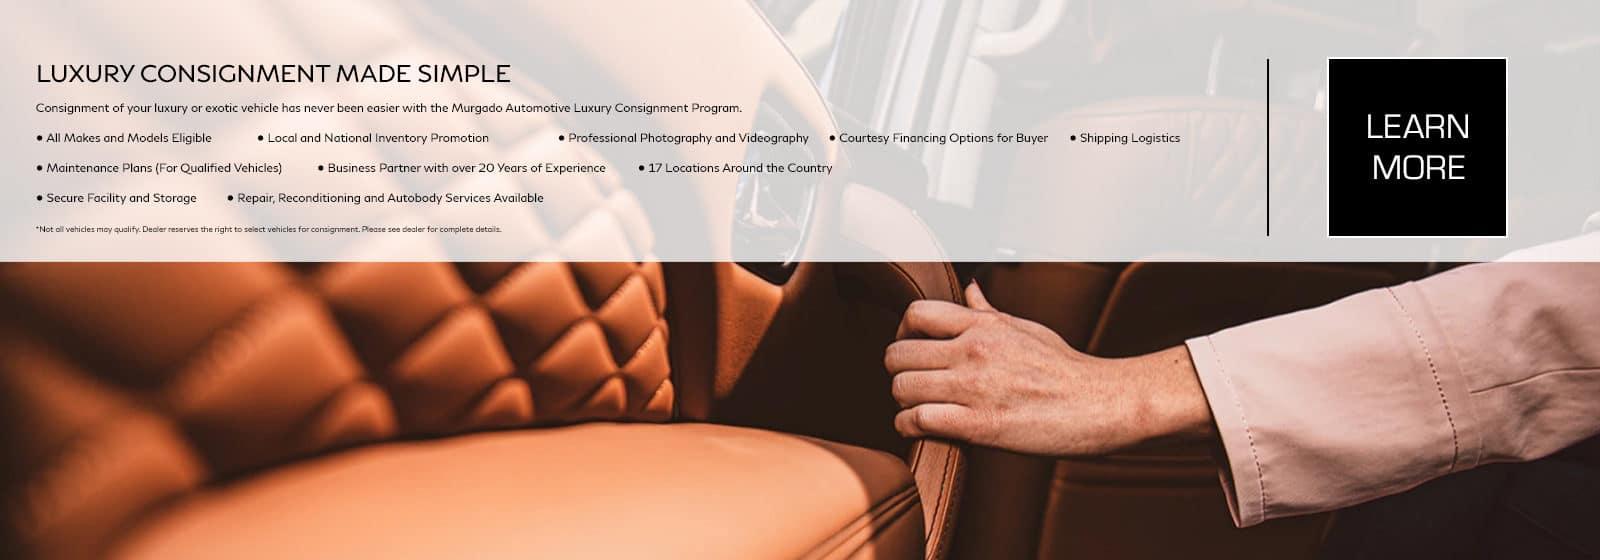 INFINITI Stuart luxury Consignment